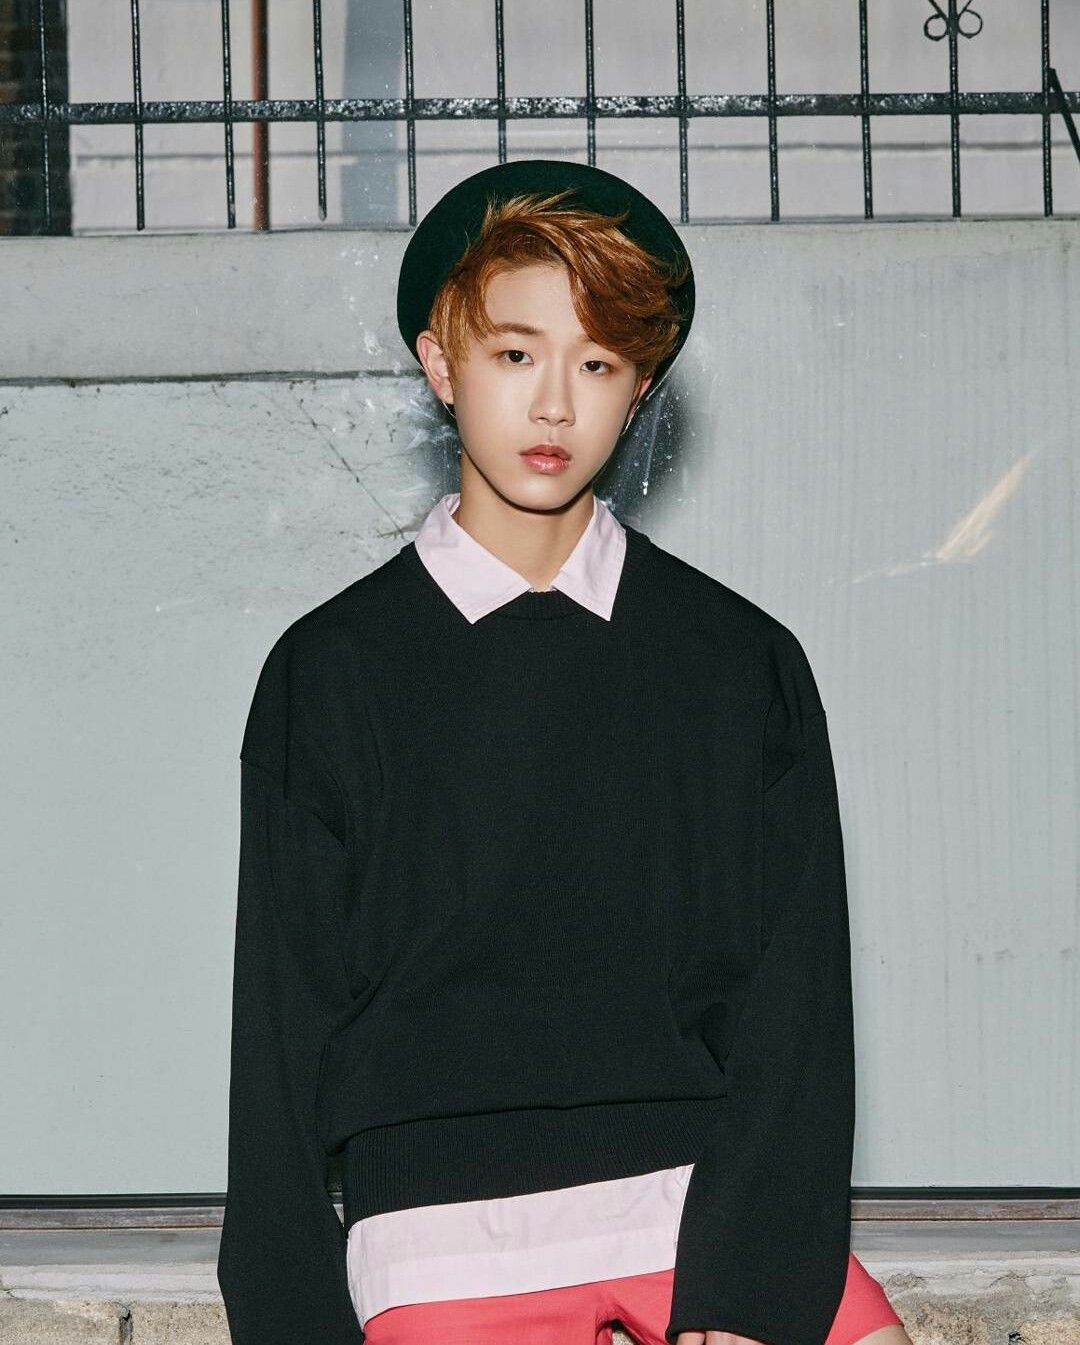 Dong Hyun #goldenchild #wooliment #bomin #jaeseok #y #jaehyun #donghyun #joochan #tag #daeyeol #jibeom #jangjun #seungmin